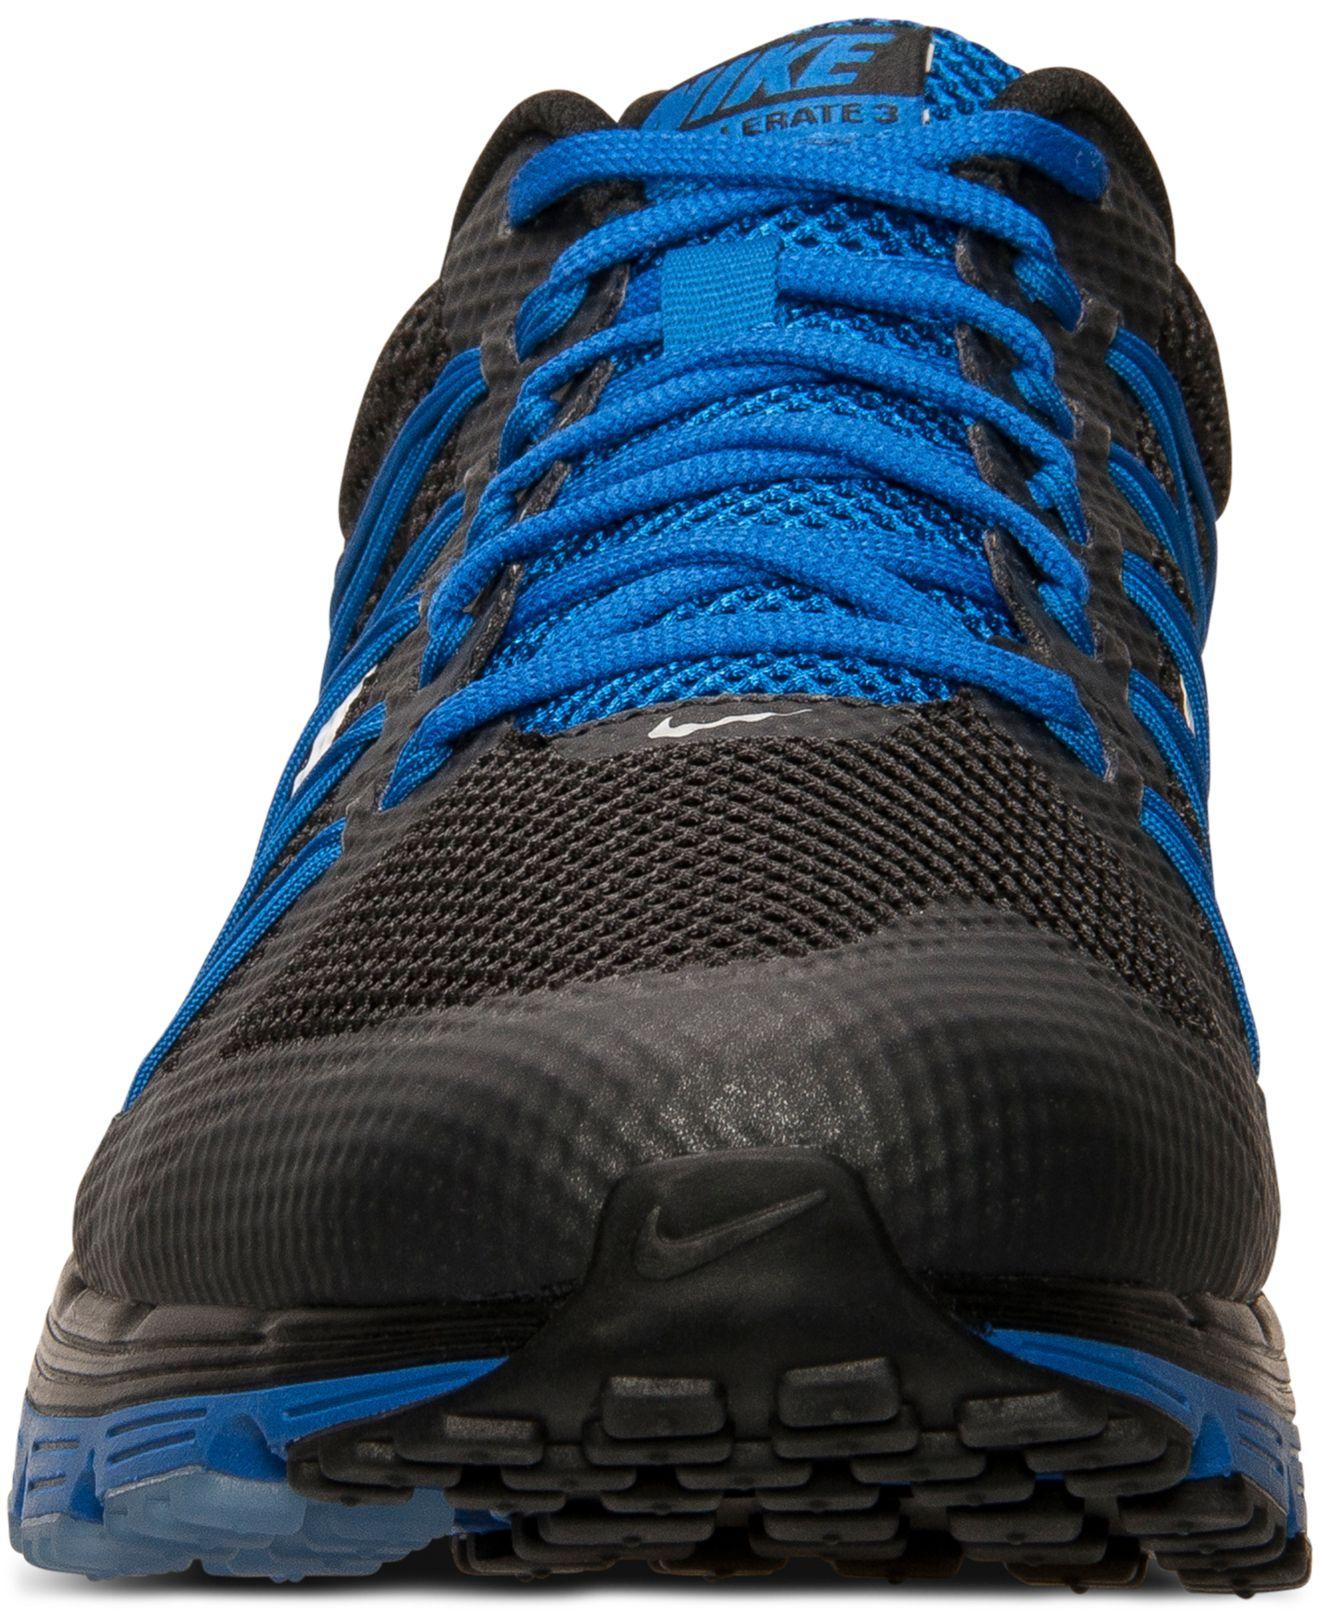 Lyst Nike Men S Air Max Excellerate 3 Running Sneakers